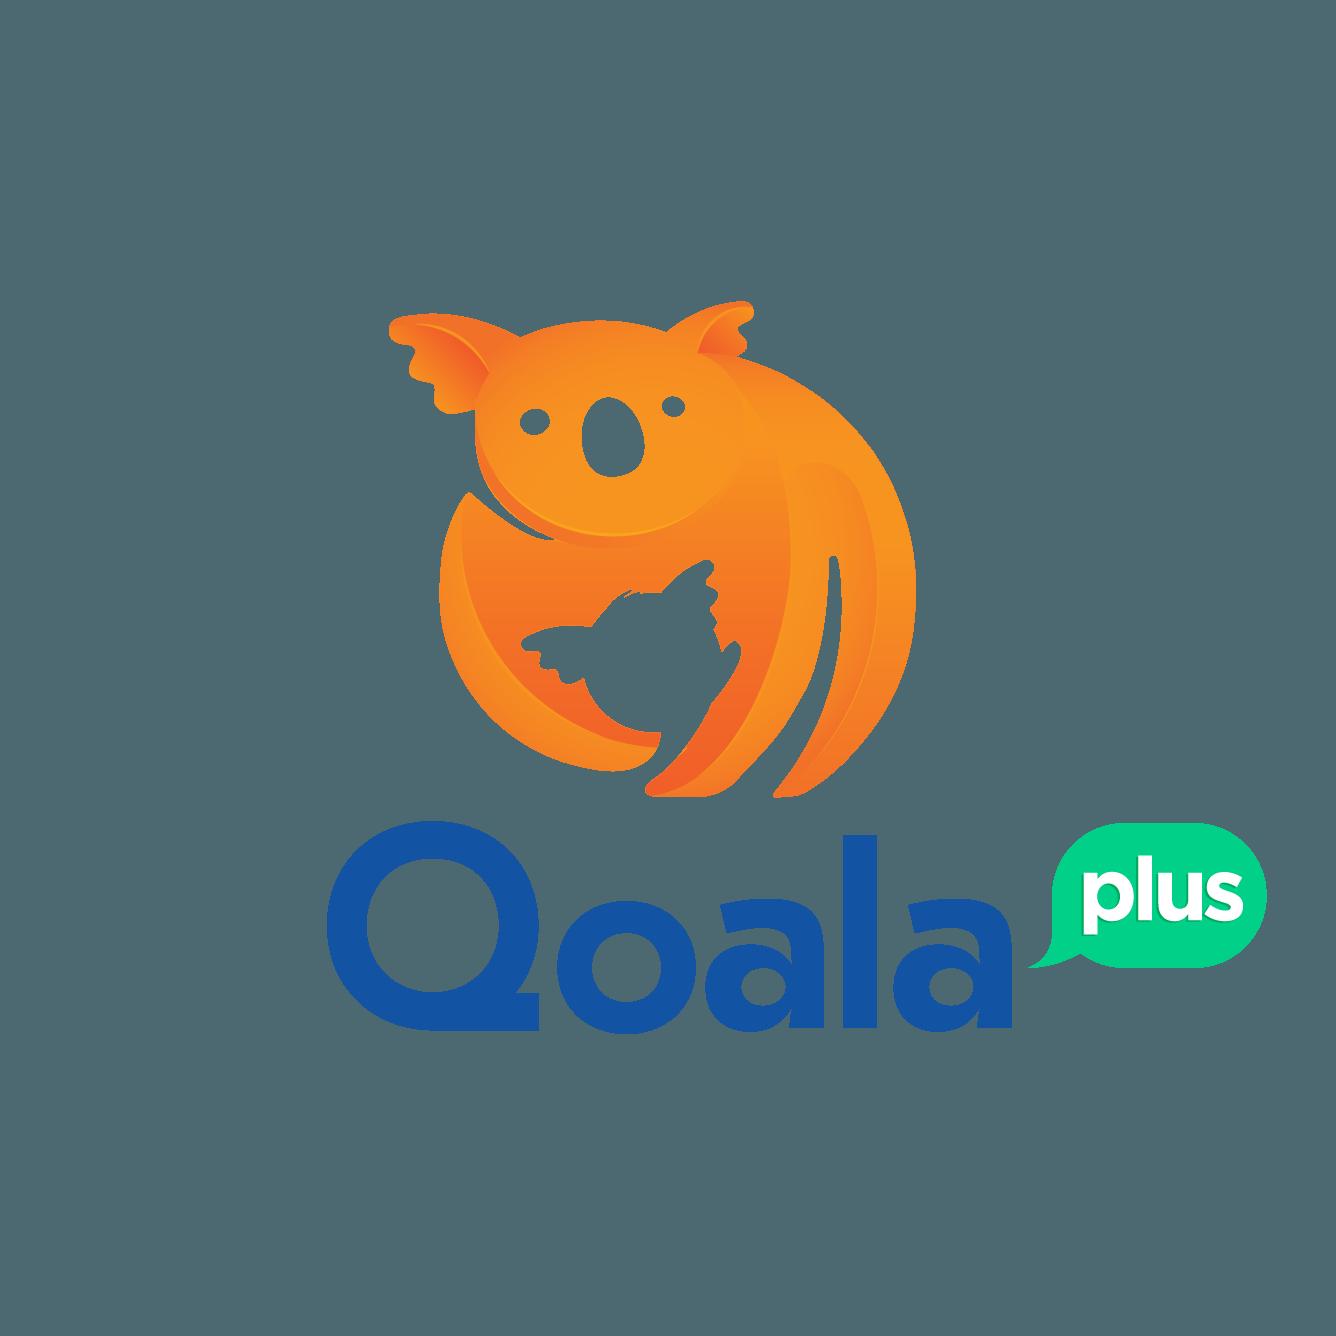 Qoala Plus